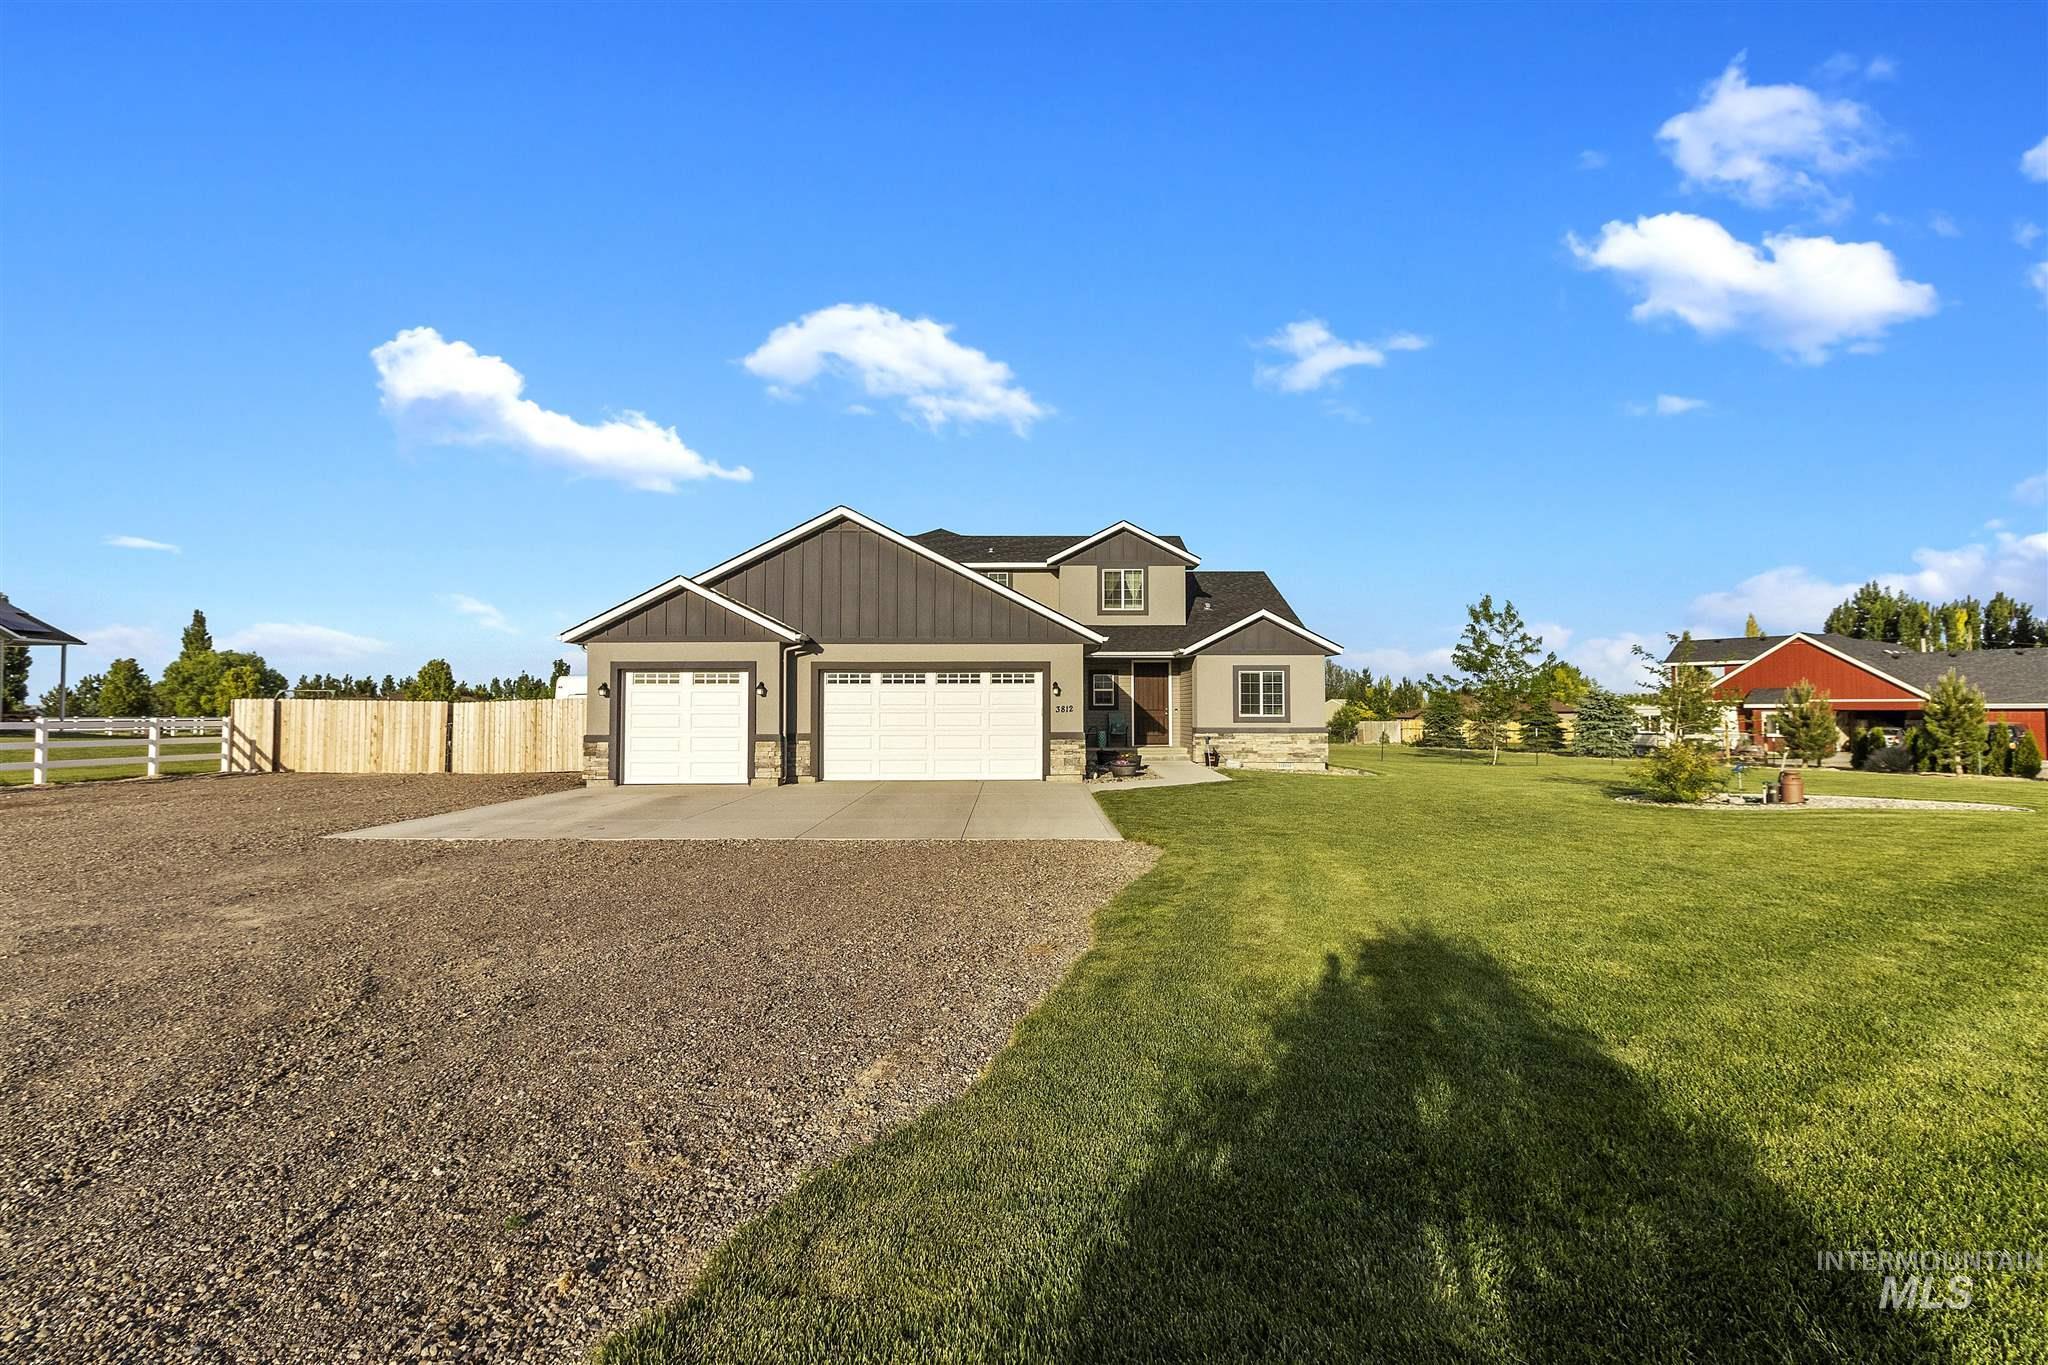 3812 N 2469 E Property Photo